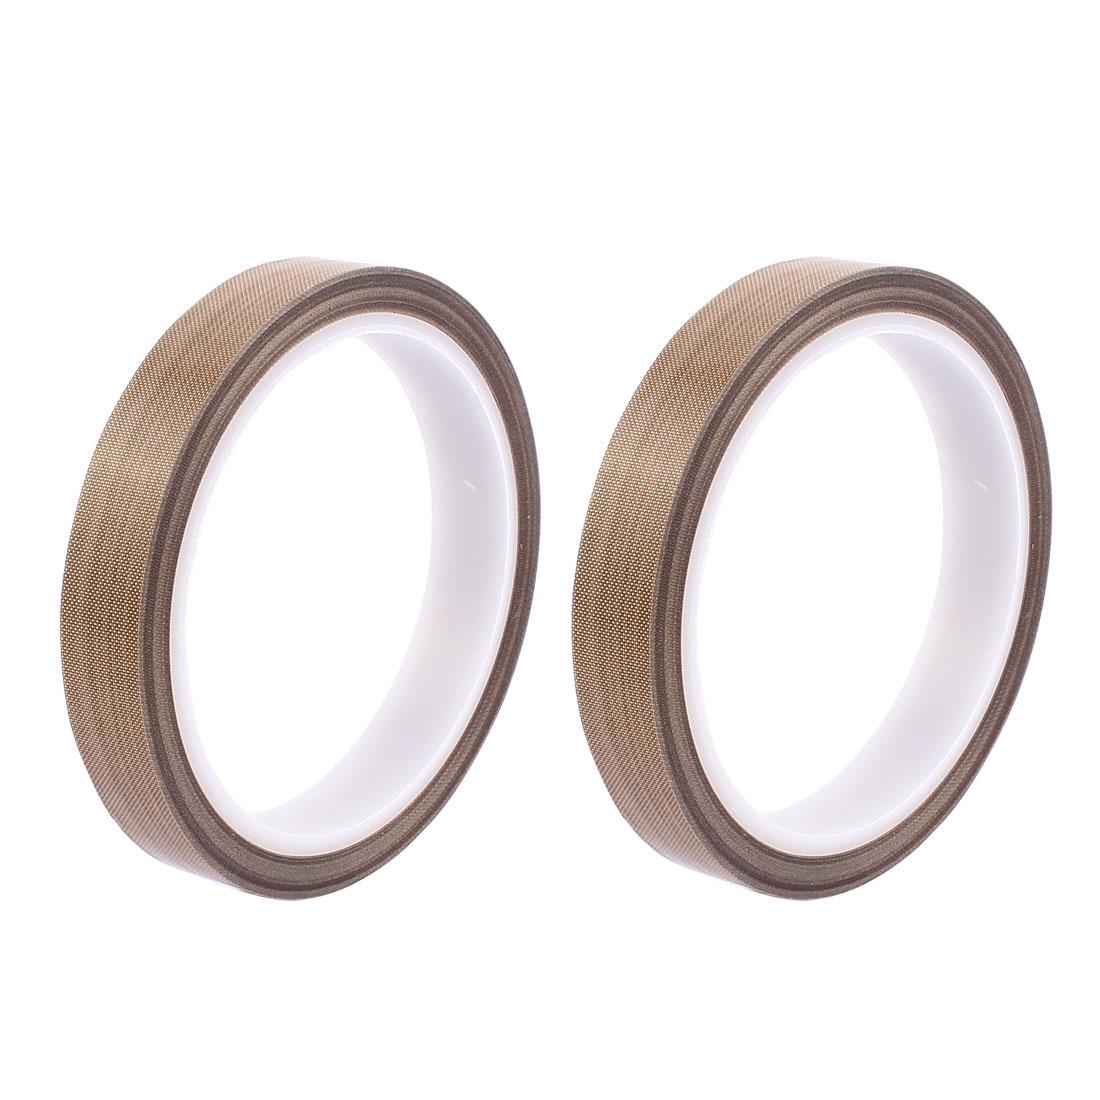 2pcs 0.18mm x 15mm Nonstick High Temperature PTFE Adhesive Tape 10M Long